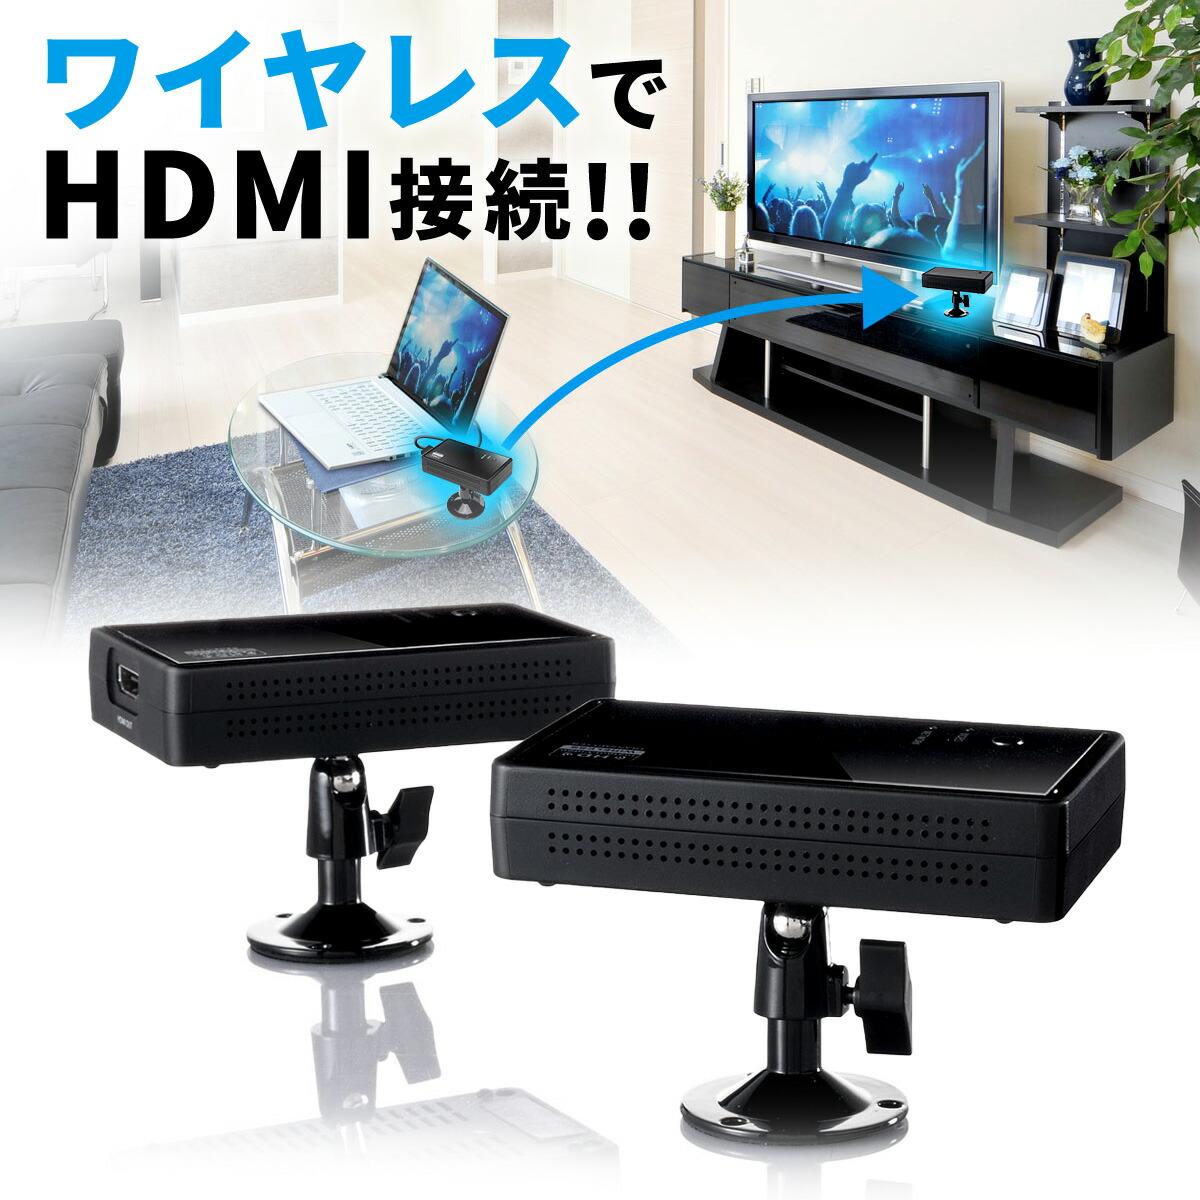 HDMIエクステンダー 無線 ワイヤレス 送受信機セット 最大通信距離50m 小型 延長 無線化ユニット[400-VGA012]【サンワダイレクト限定品】【送料無料】